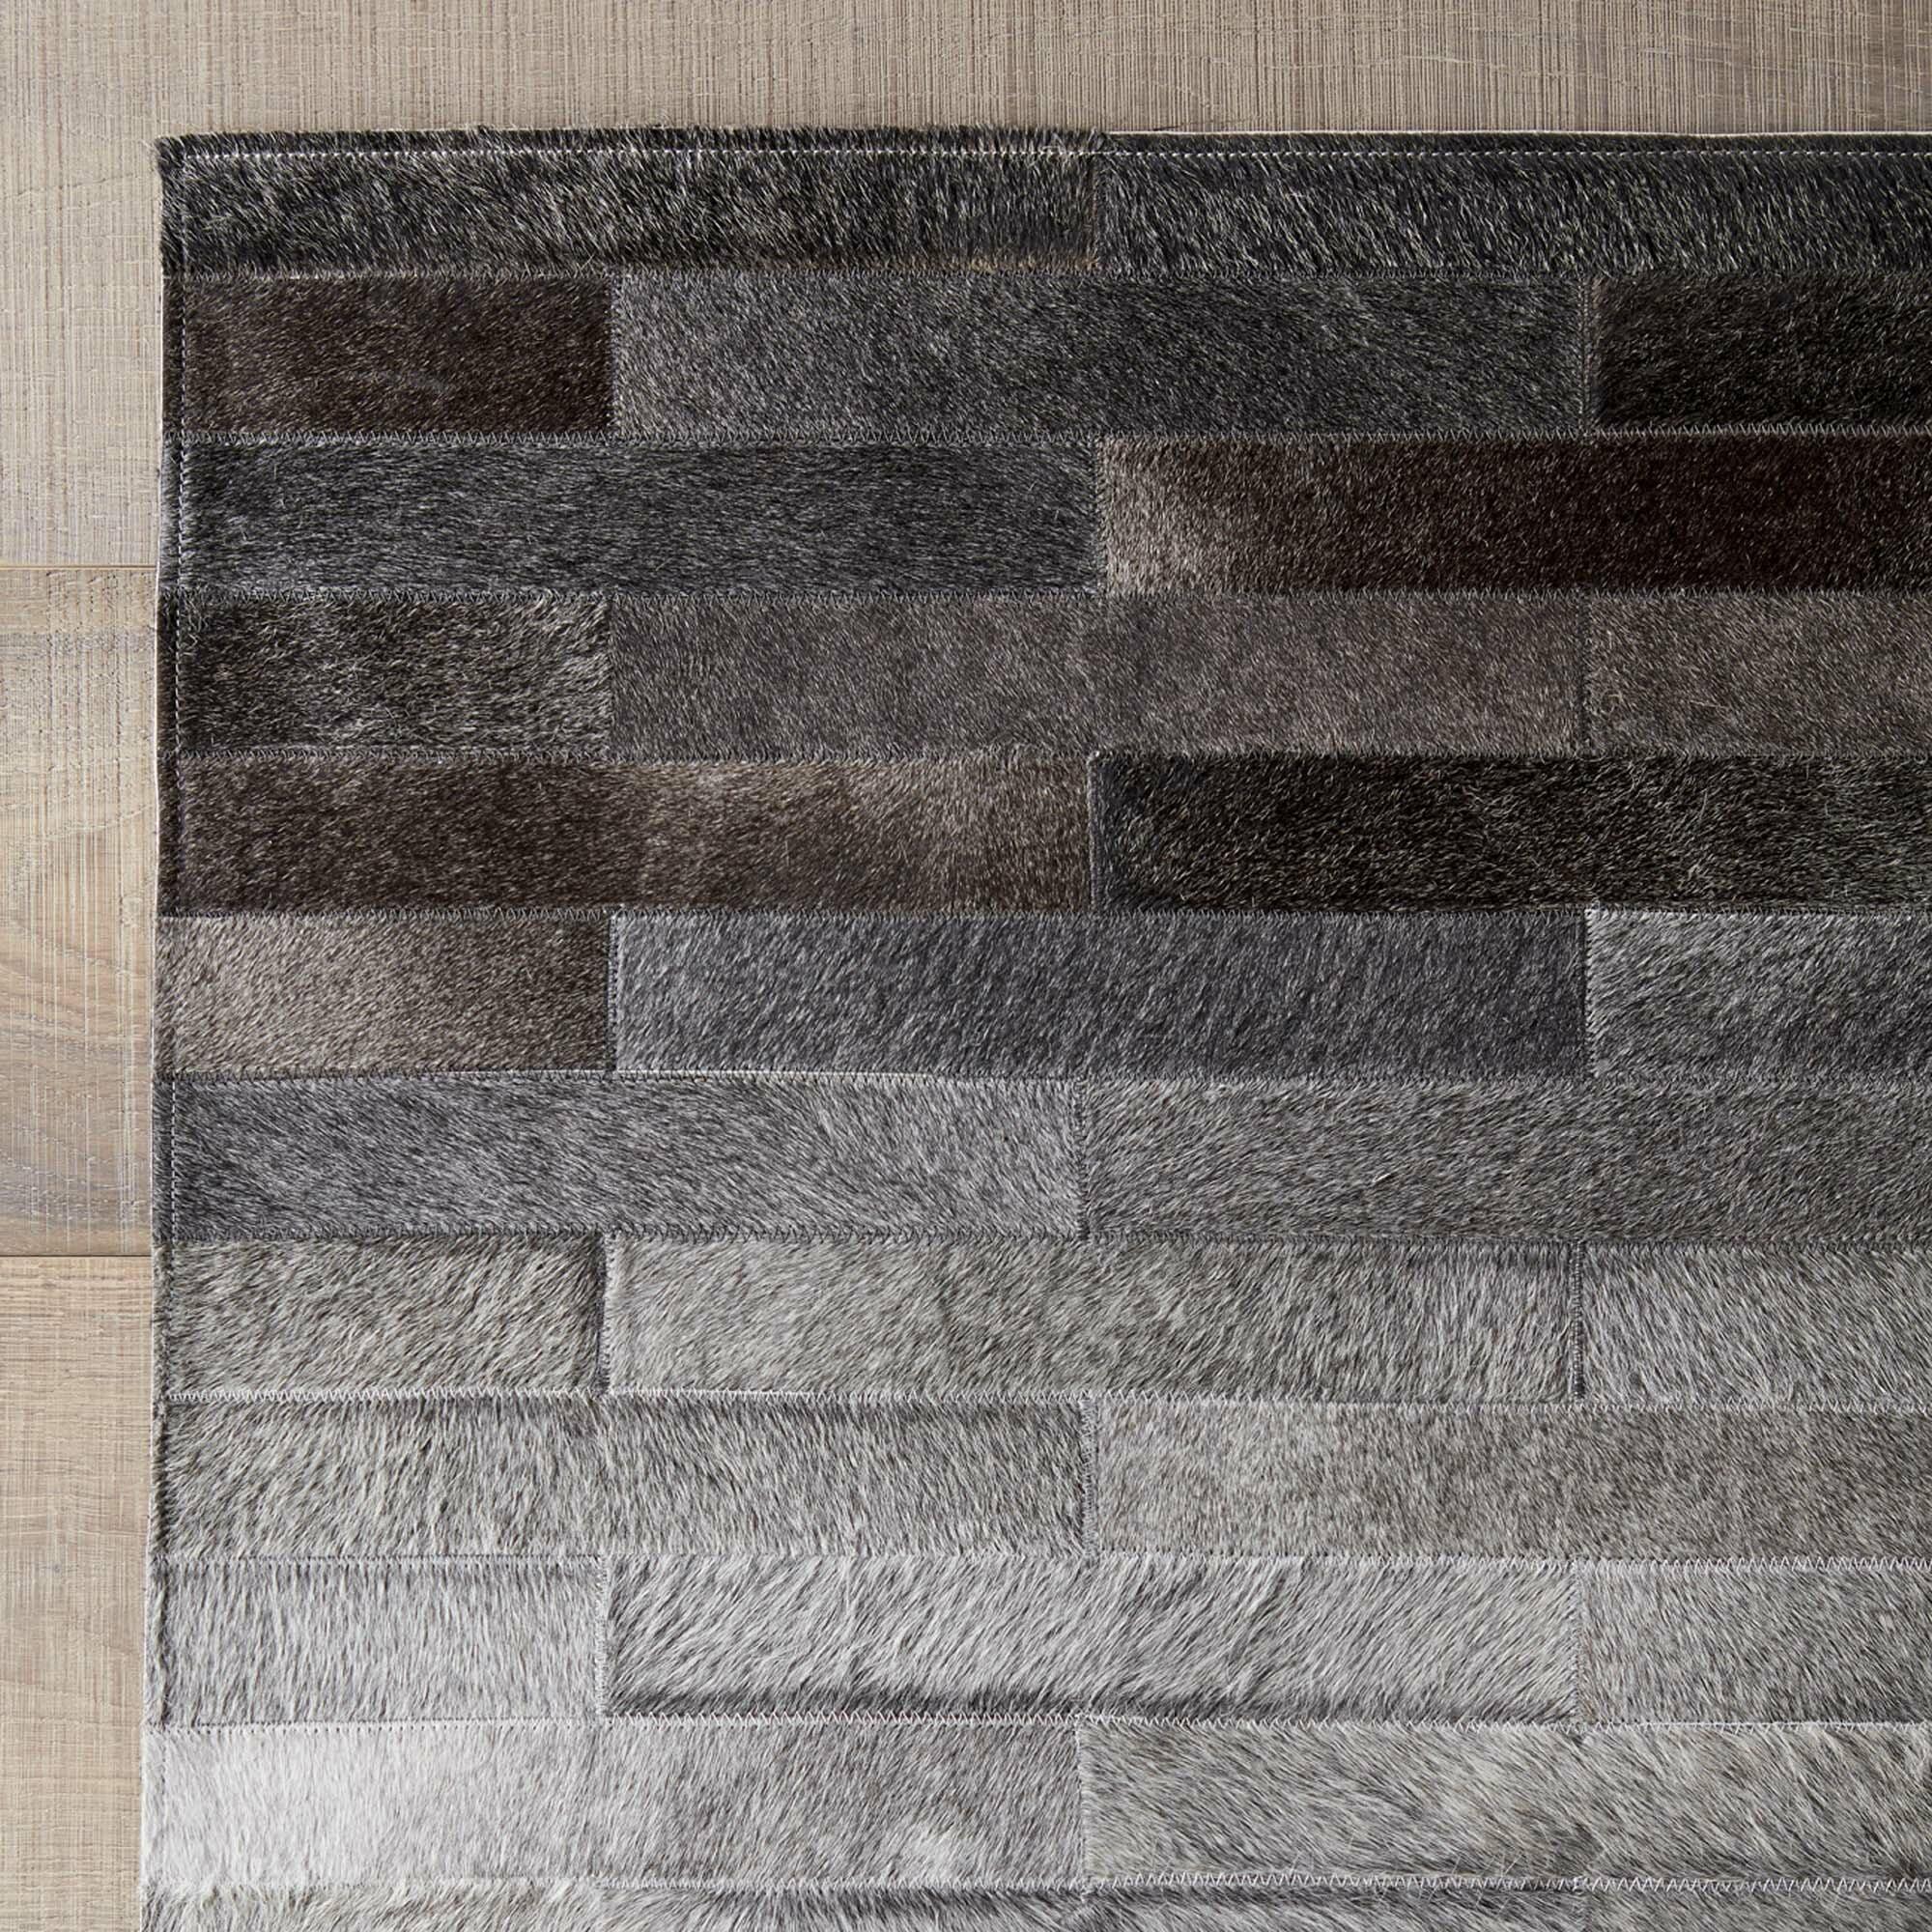 rugs area rugs 5 39 x 8 39 area rugs dwellstudio sku dwl12598